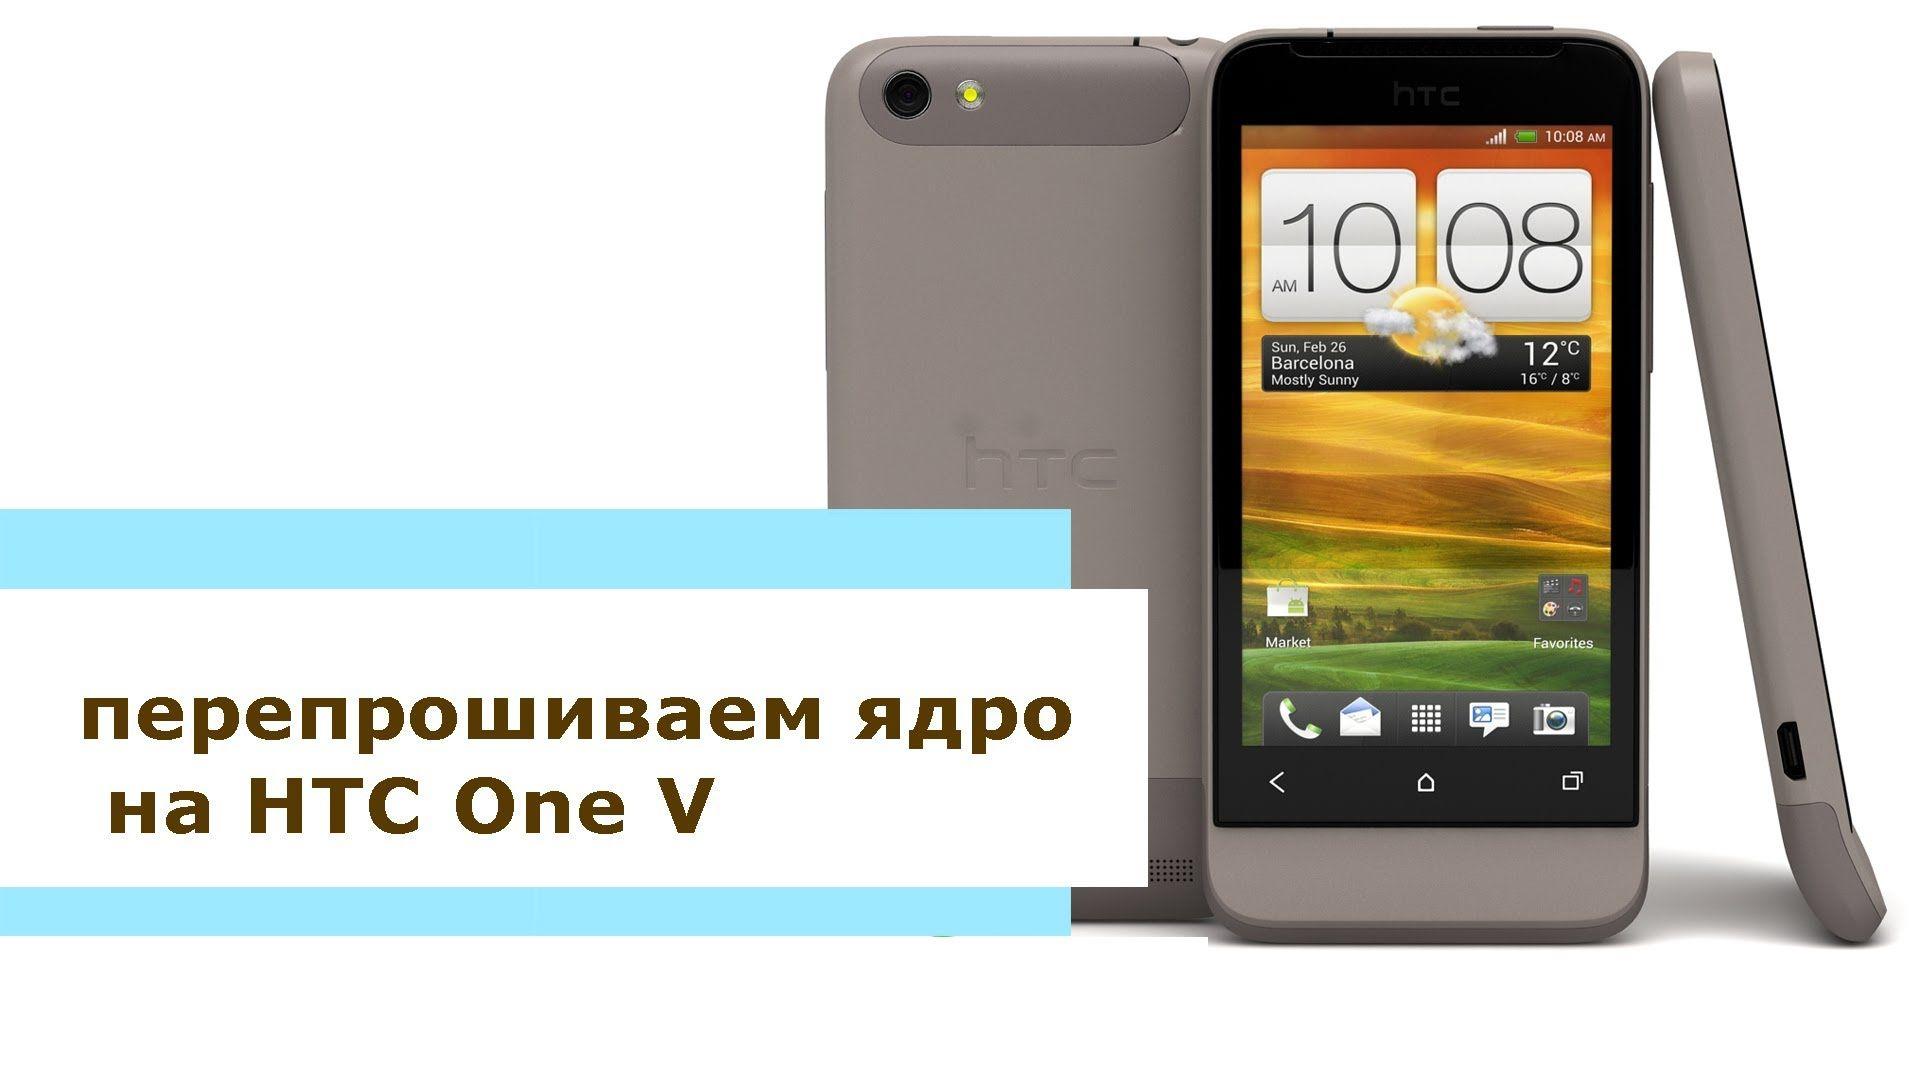 Официальная прошивка для HTC One S